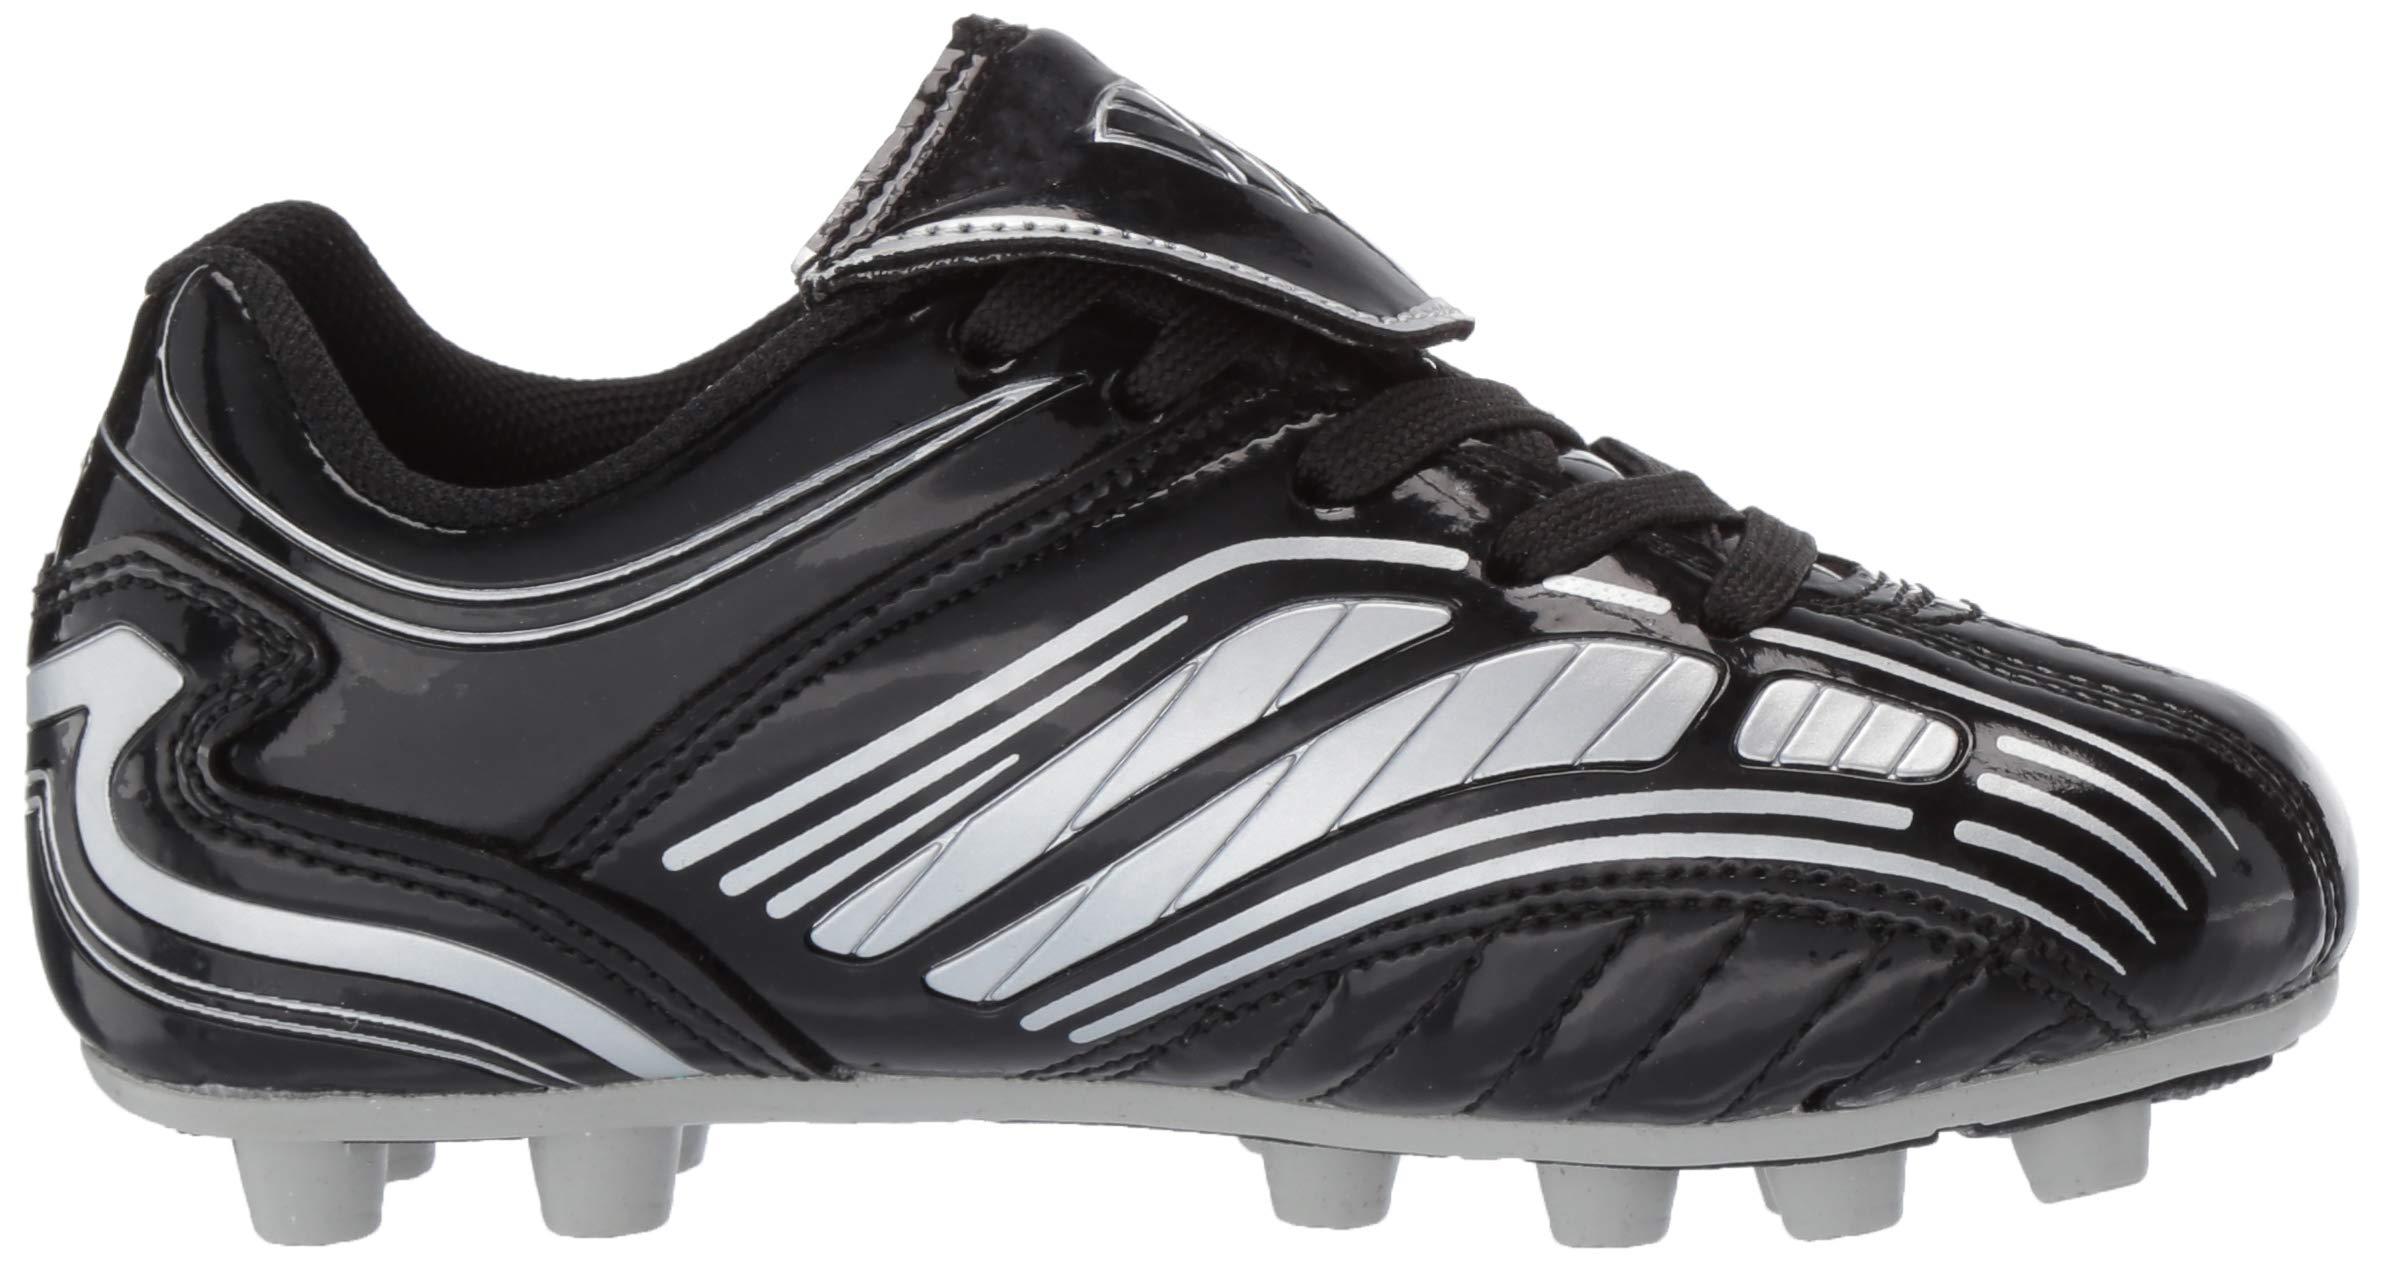 Vizari Striker FG Soccer Shoe (Toddler/Little Kid/Big Kid),Black/Silver,10 M US Toddler by Vizari (Image #7)